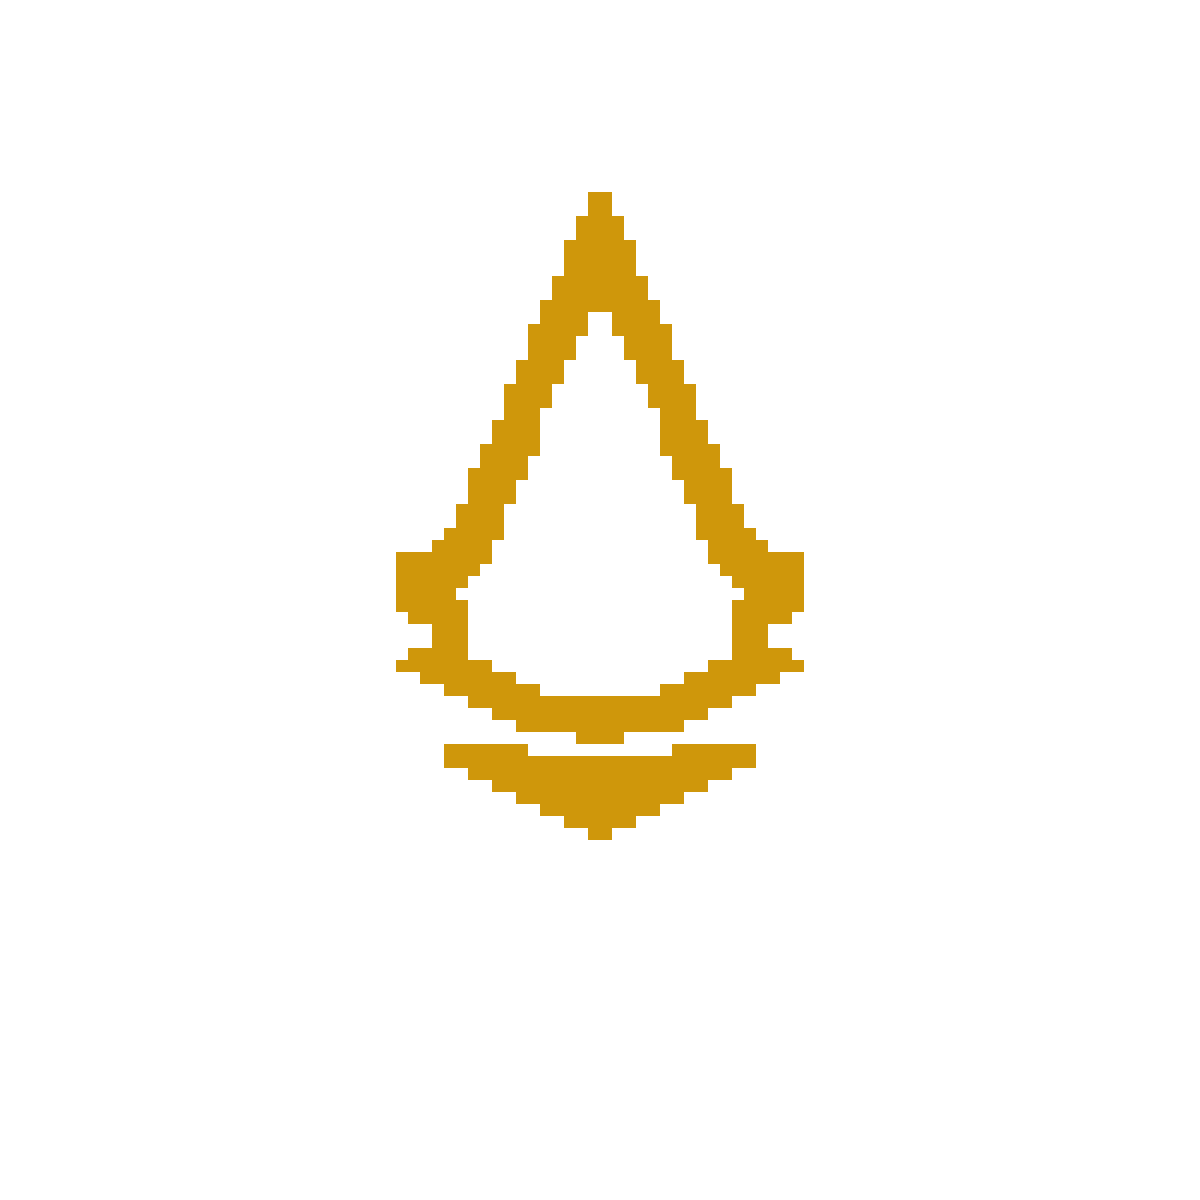 Pixilart Assassin Creed Symbol Gold By Koolkorben